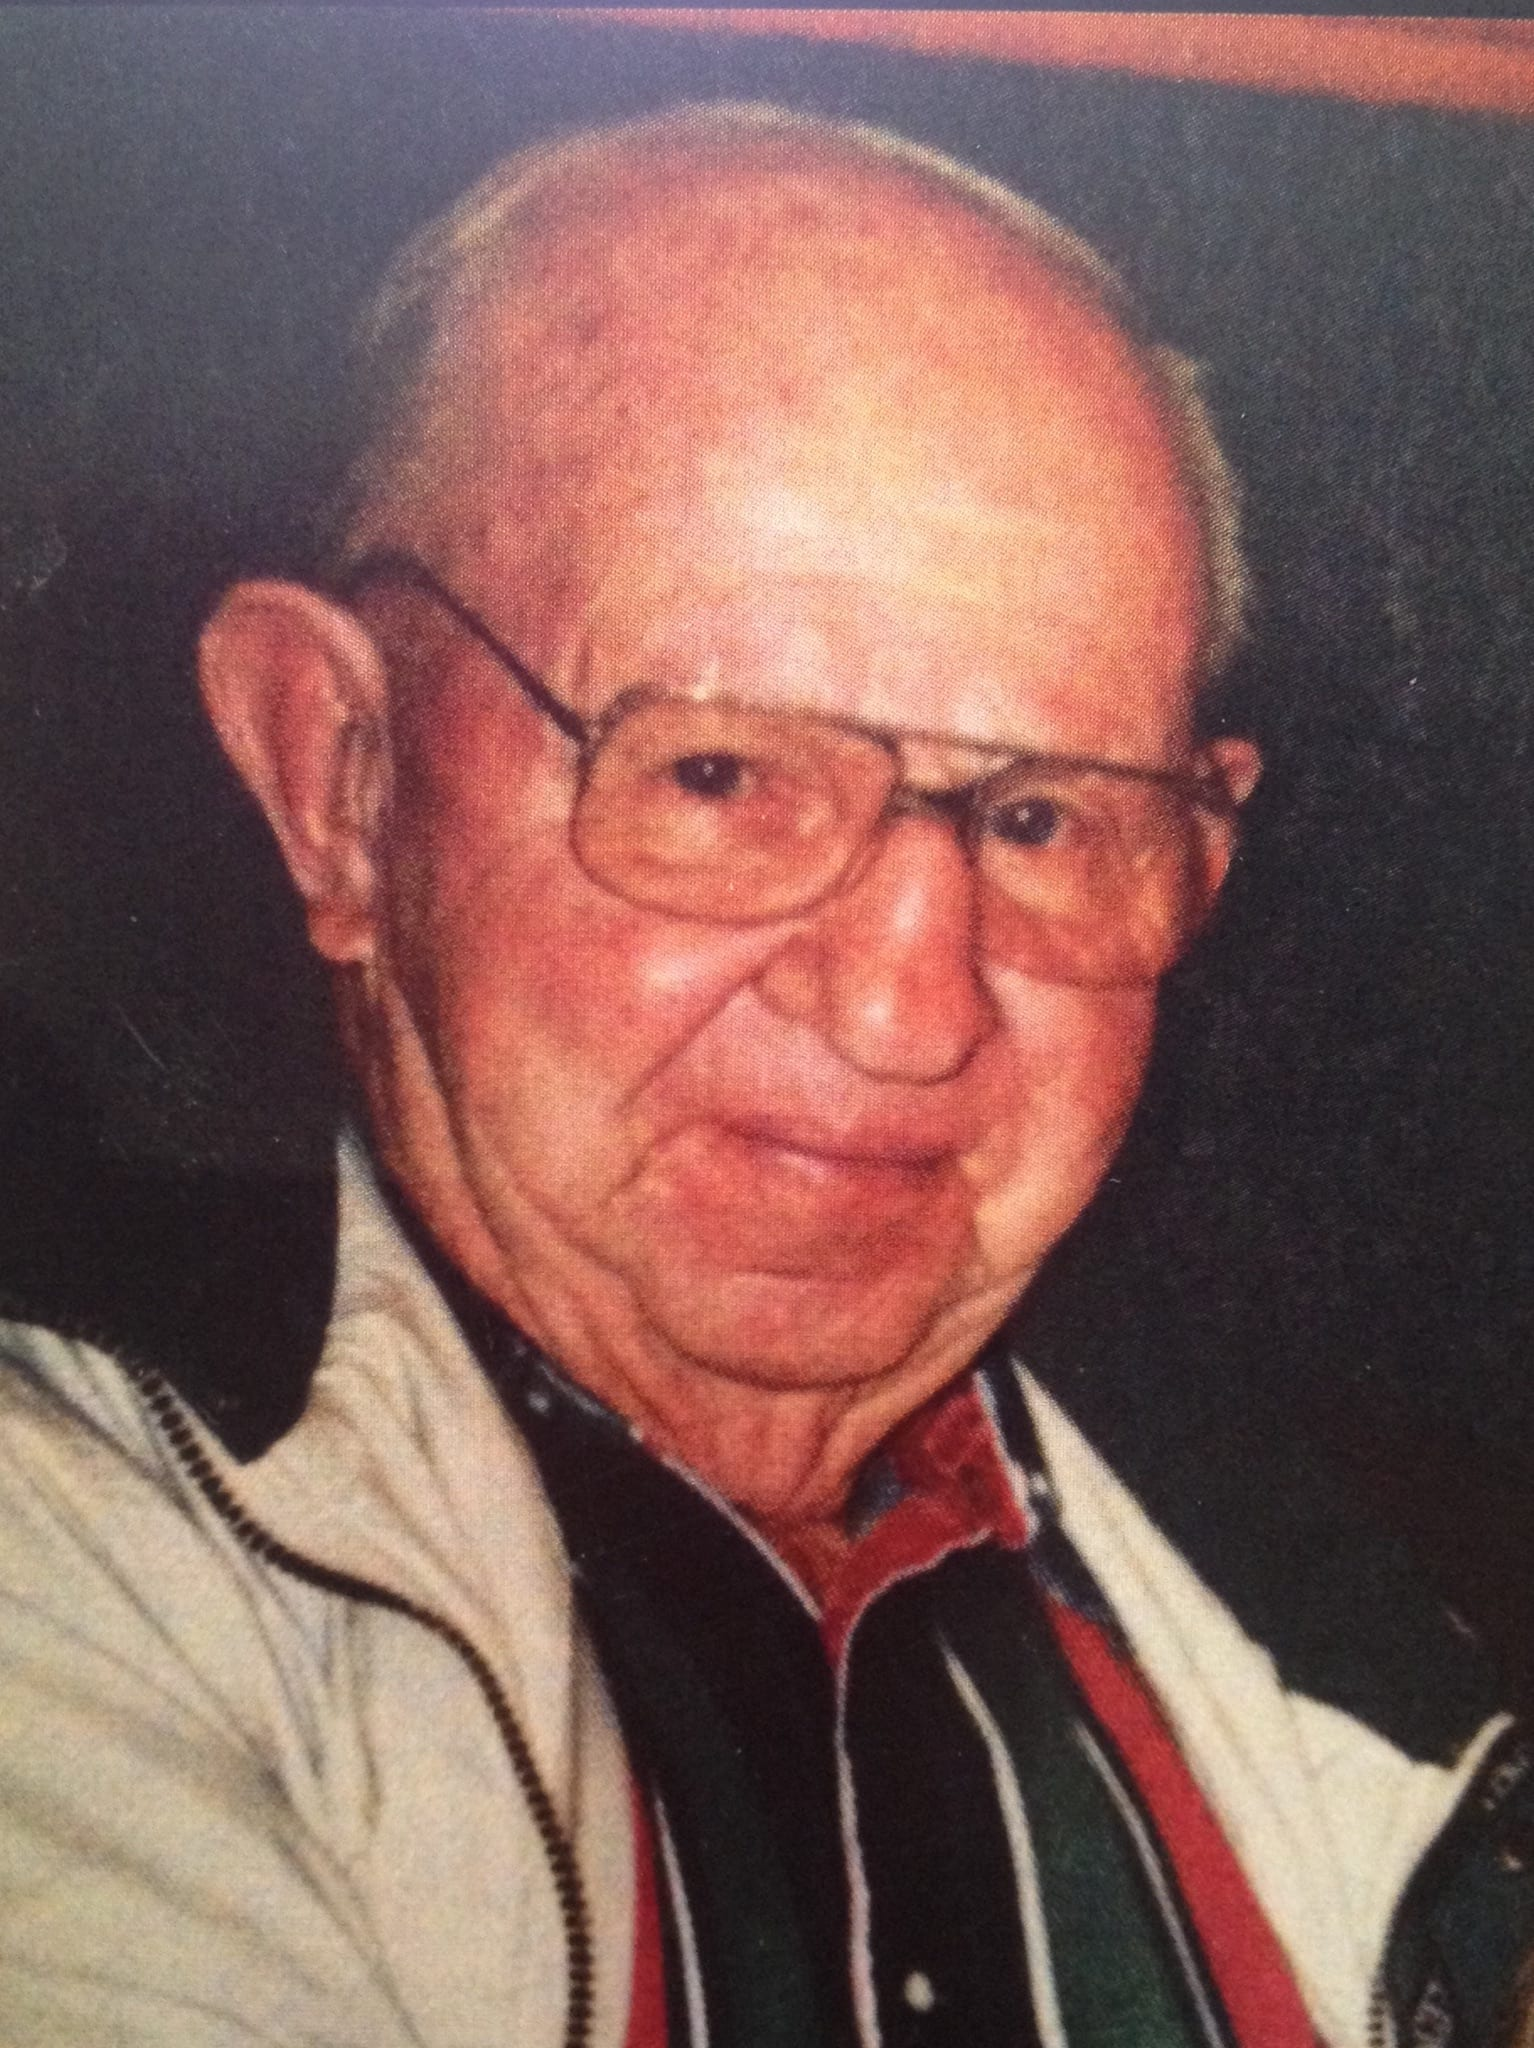 James M. Murphy, 95